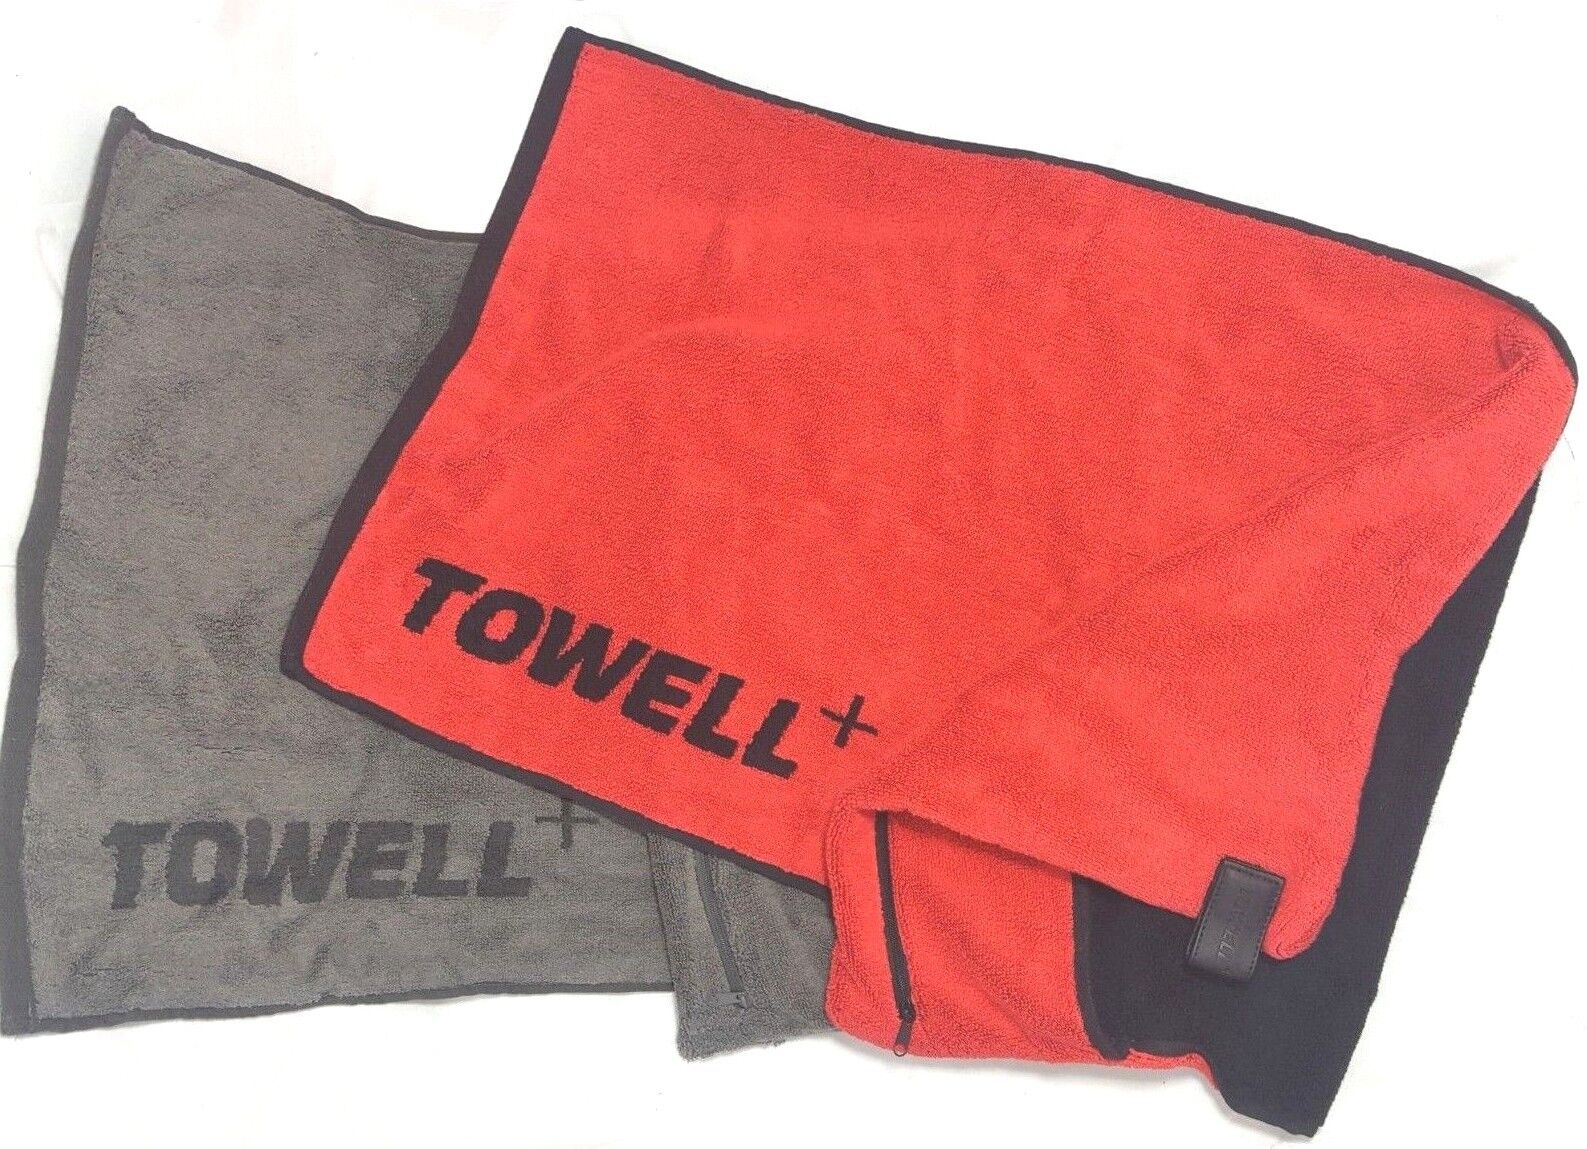 Towell Sporthandtuch Fitnesshandtuch Handtuch 40x90cm - Rot, Grau & Rot und Grau